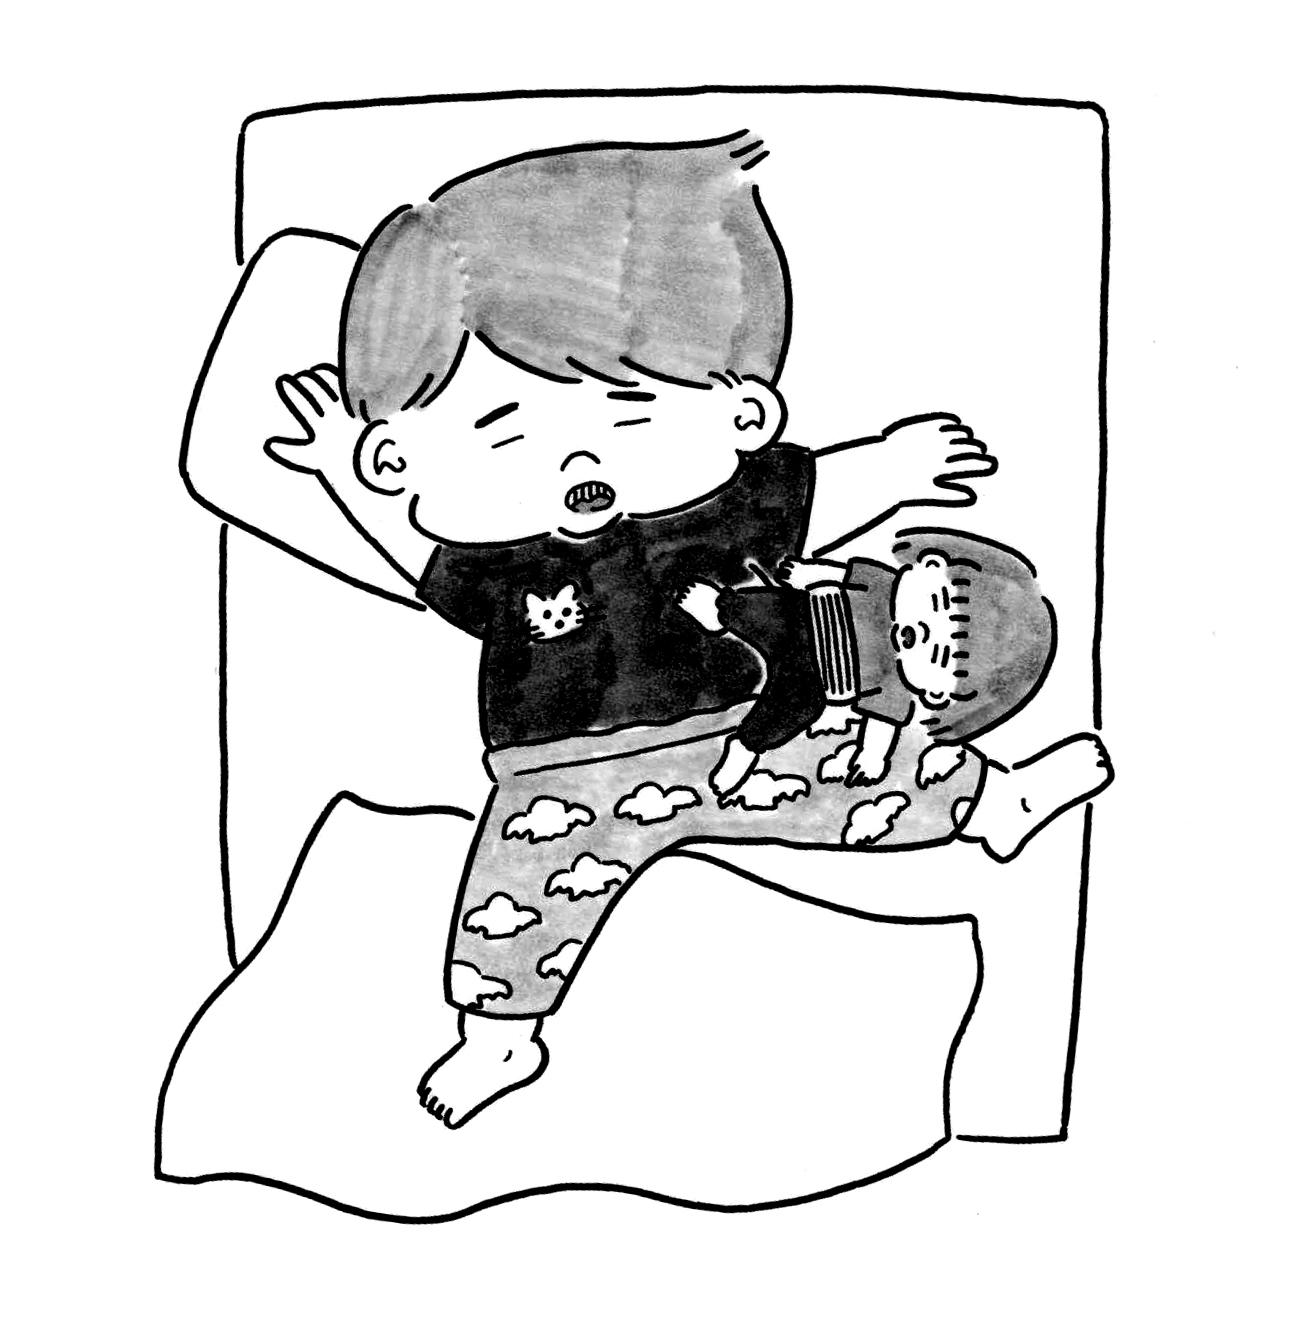 Twitter発4コマ漫画で話題! <br />育児に奮闘するお父さんの泣き笑いに共感の声集まる